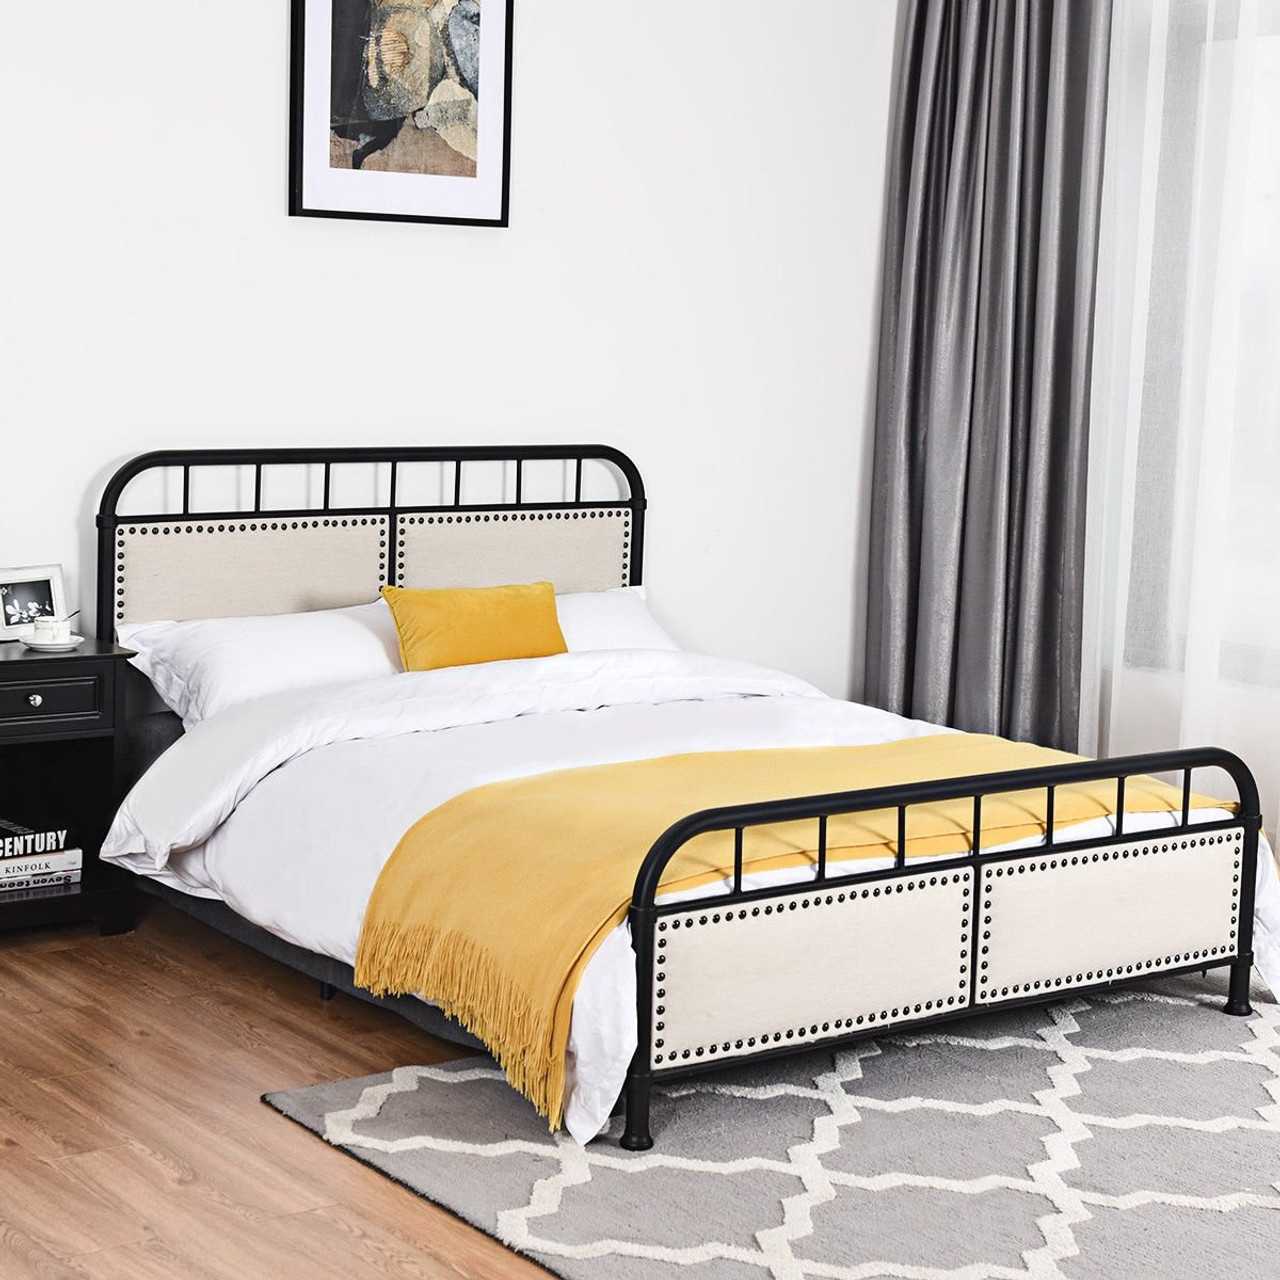 Queen Size Metal Bed Frame Platform Bed Upholstered Panel Headboard Footboard Black Hw59207bk By Cw